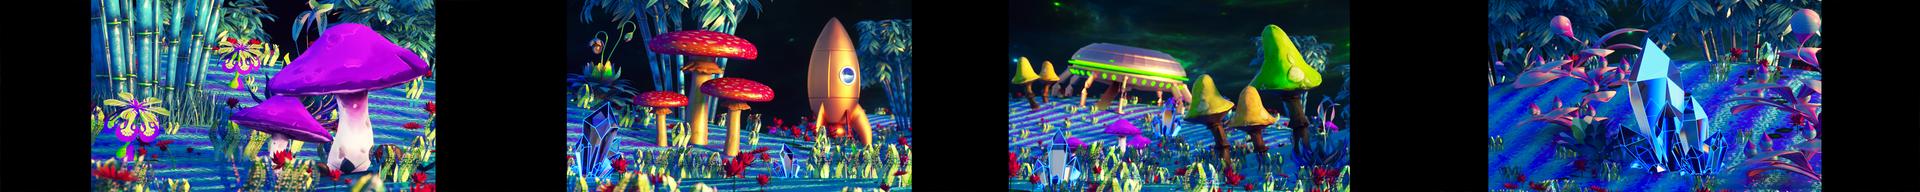 ToyTopia_Storyboard_v2 16.png